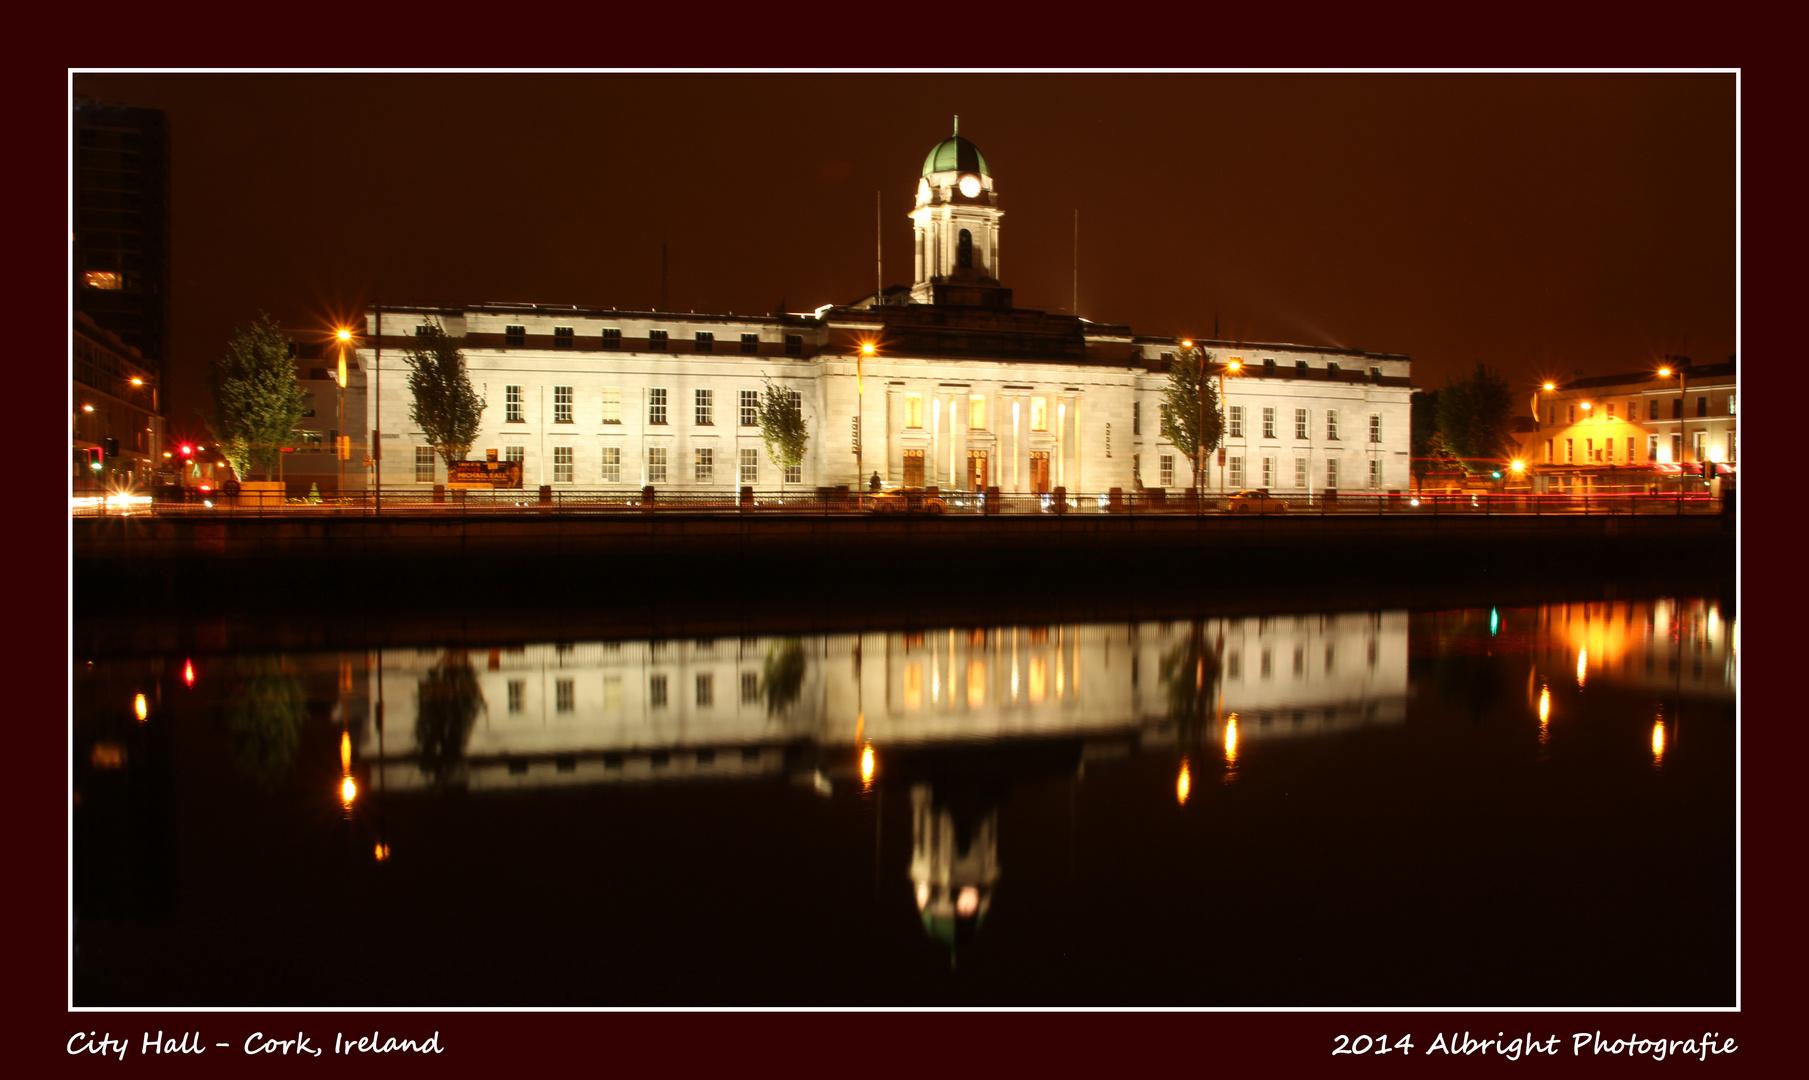 City Hall, Cork